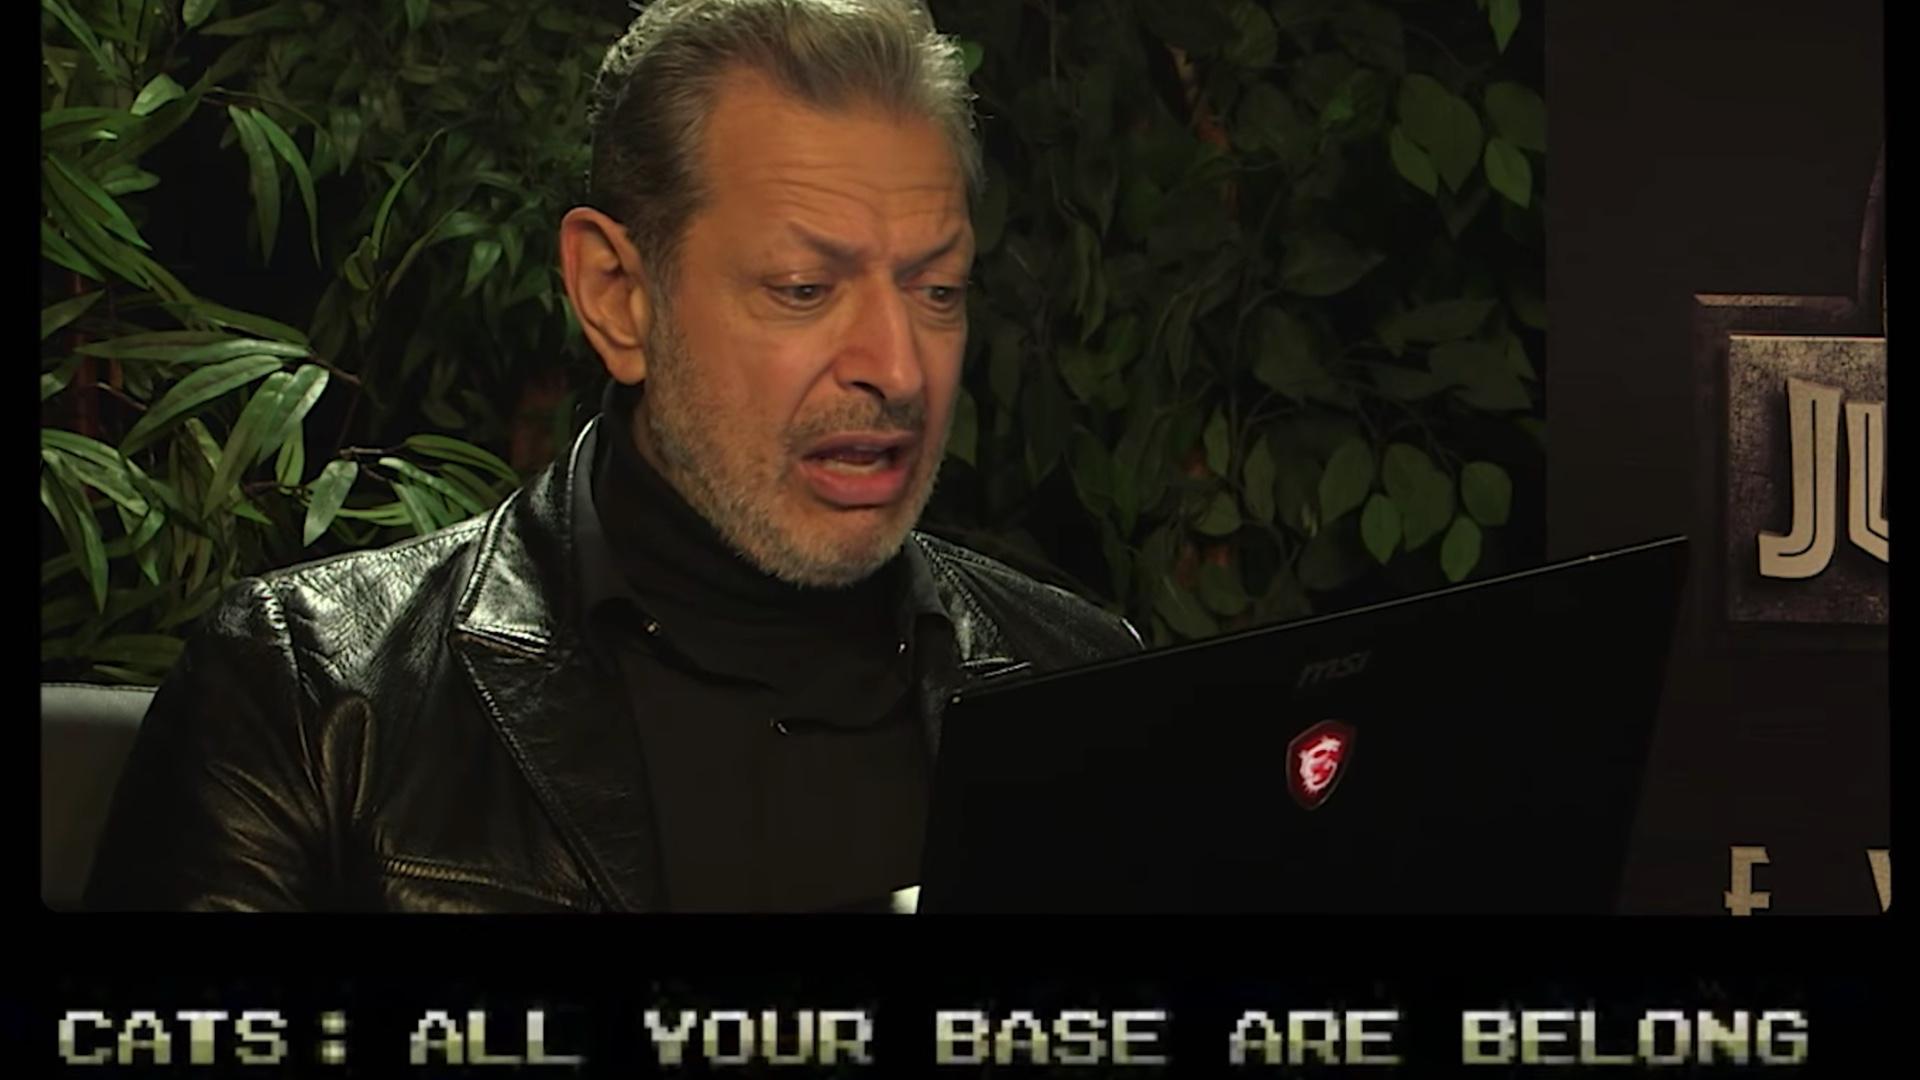 watch-jeff-goldblum-hilariously-read-famous-video-game-dialogue-social.jpg